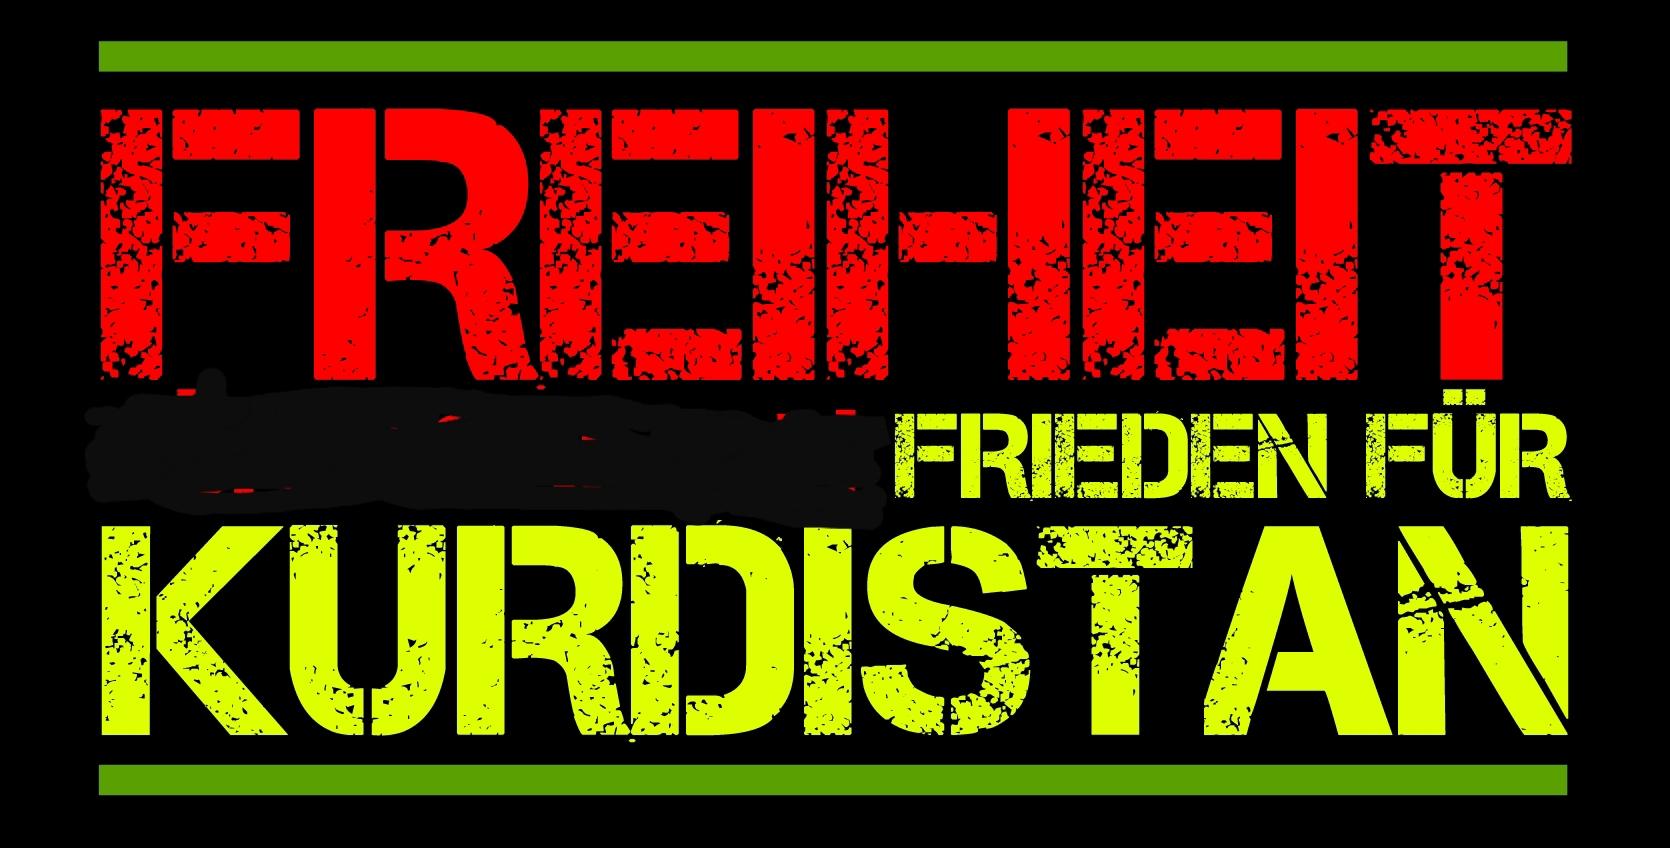 Freiheifuer_Kurdistan_LOGO.jpg